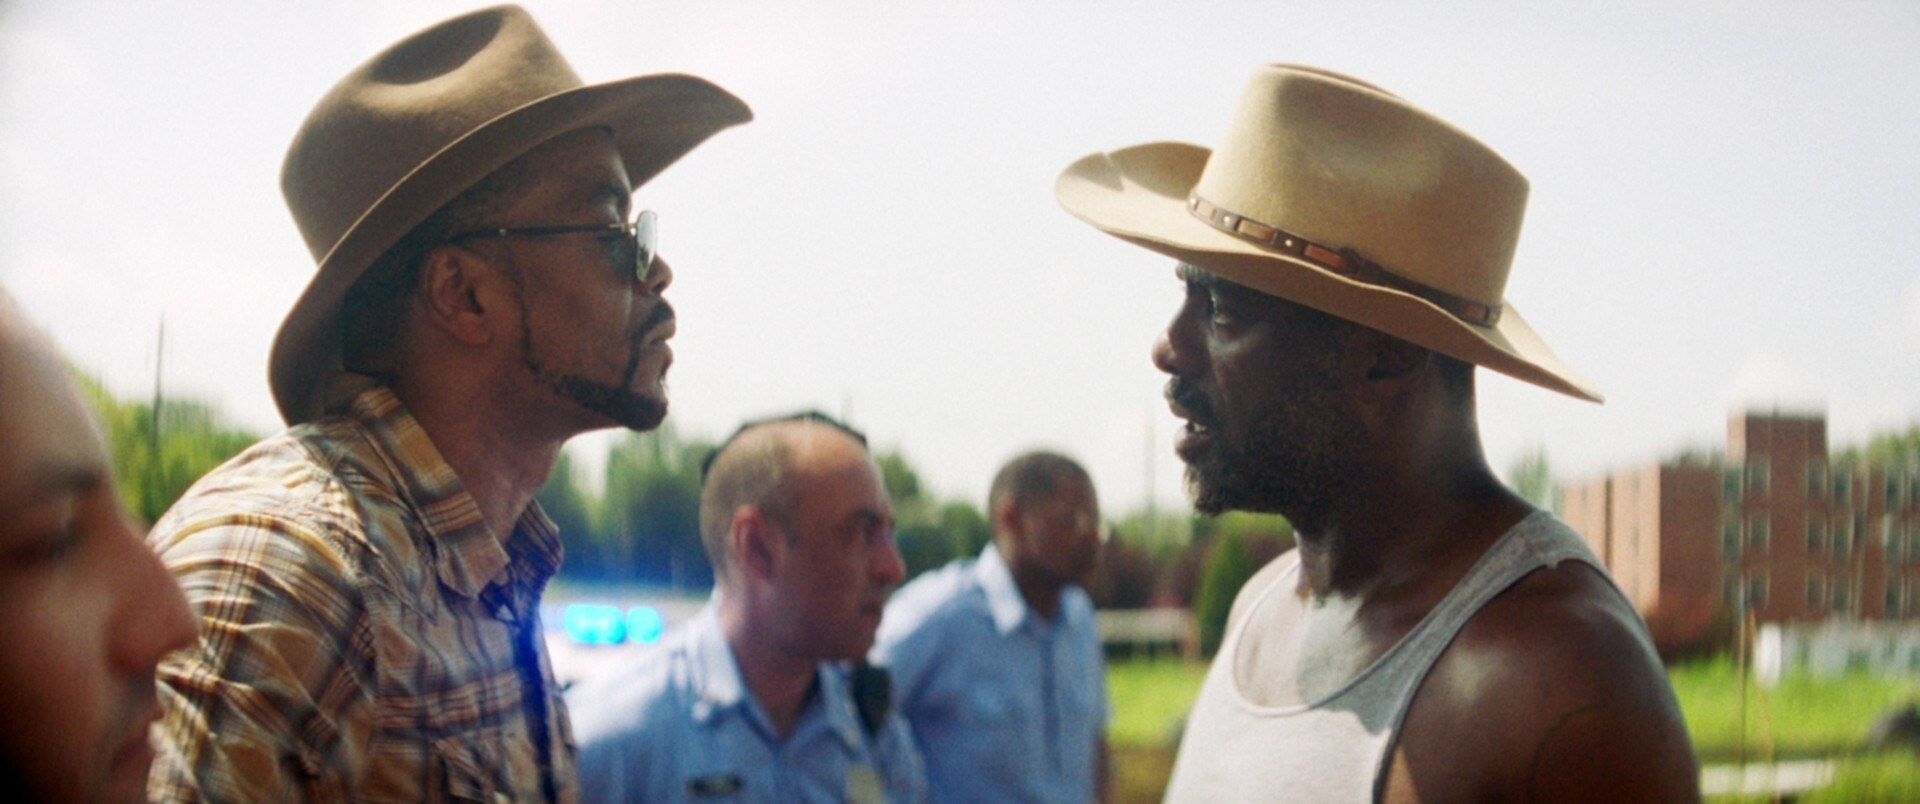 Method Man confronts Idris Elba